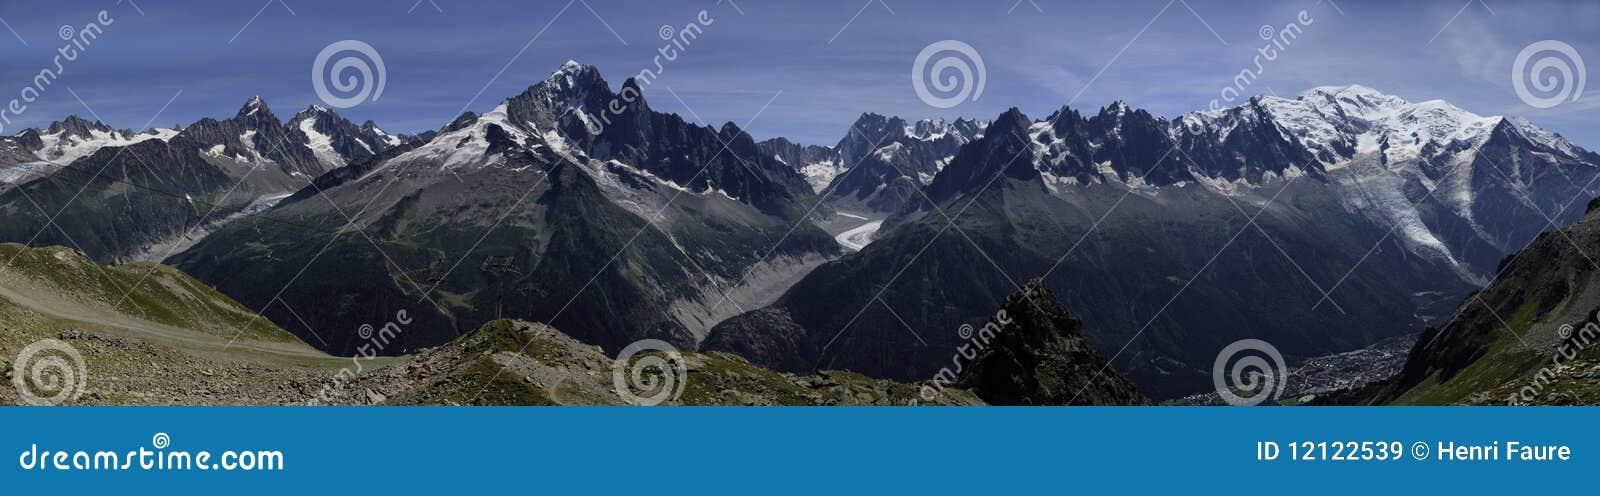 Blanc mont范围